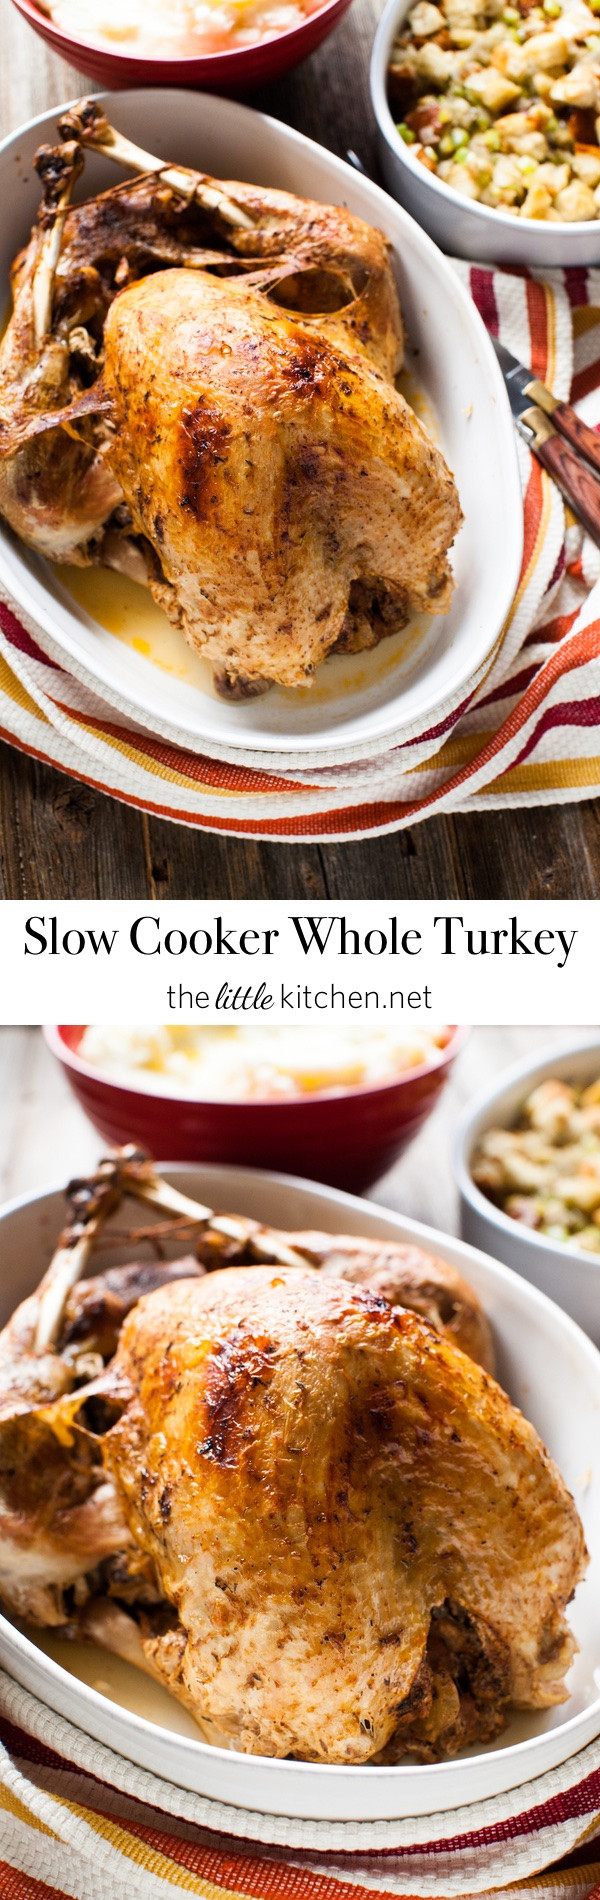 Slow Cooker Whole Turkey  Slow Cooker Whole Turkey The Little Kitchen